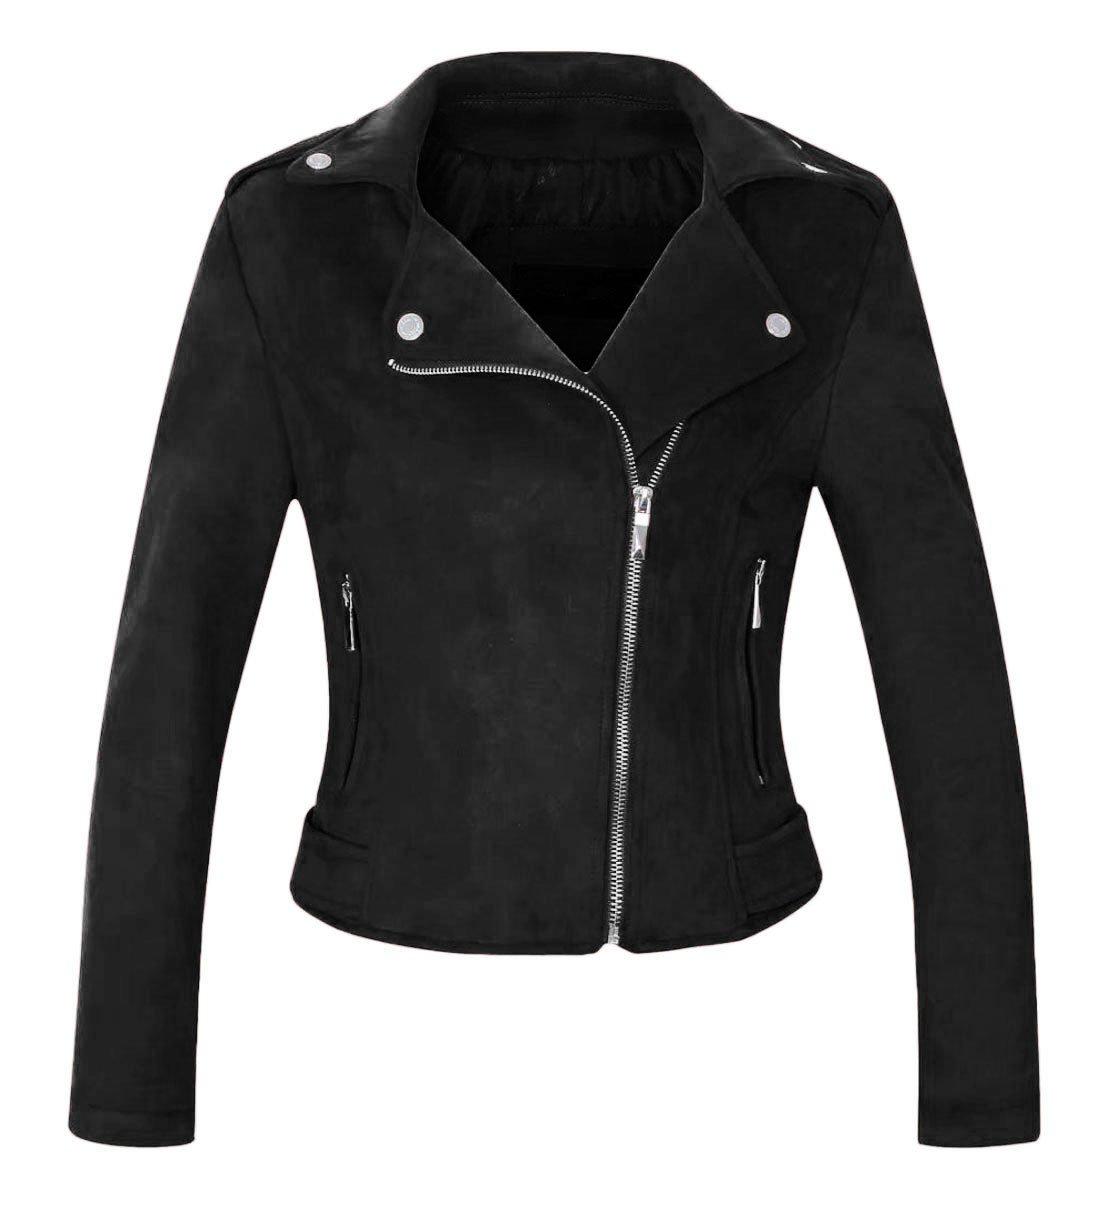 Chartou Women's Stylish Notched Collar Oblique Zip Suede Leather Moto Jacket (Medium, Black)